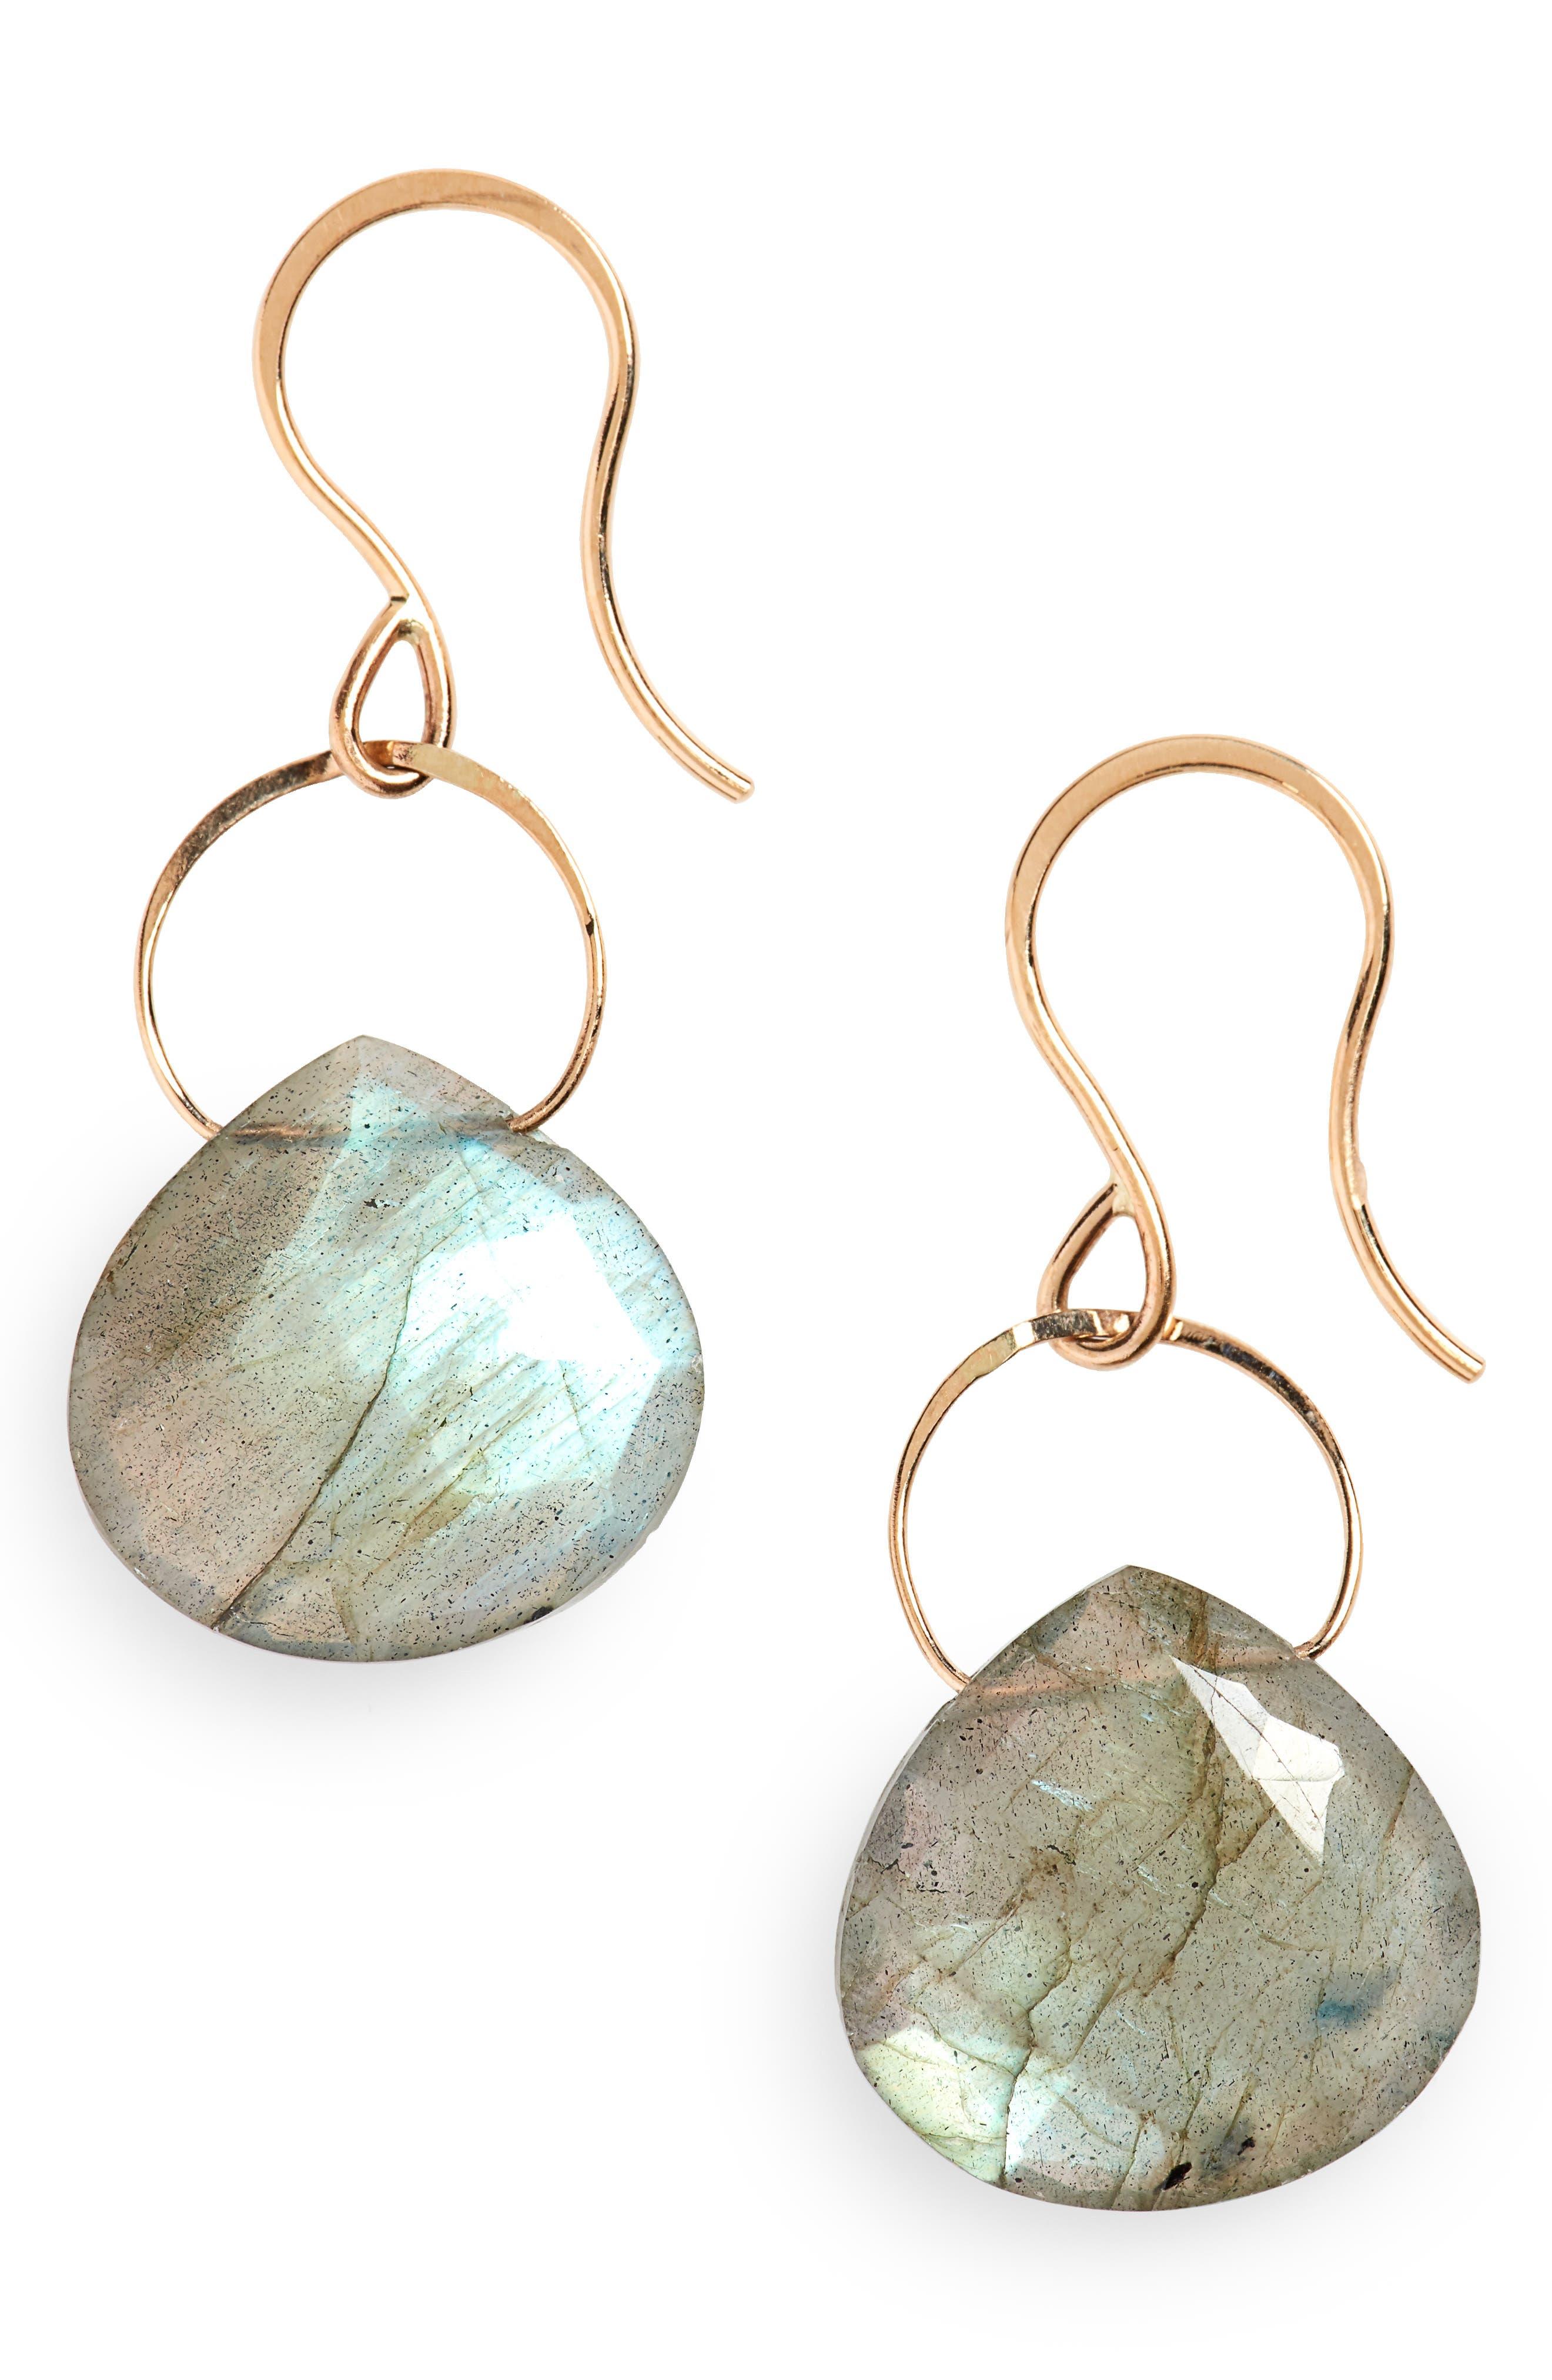 Semiprecious Stone Drop Earrings,                             Alternate thumbnail 2, color,                             LABRADORITE/ YELLOW GOLD